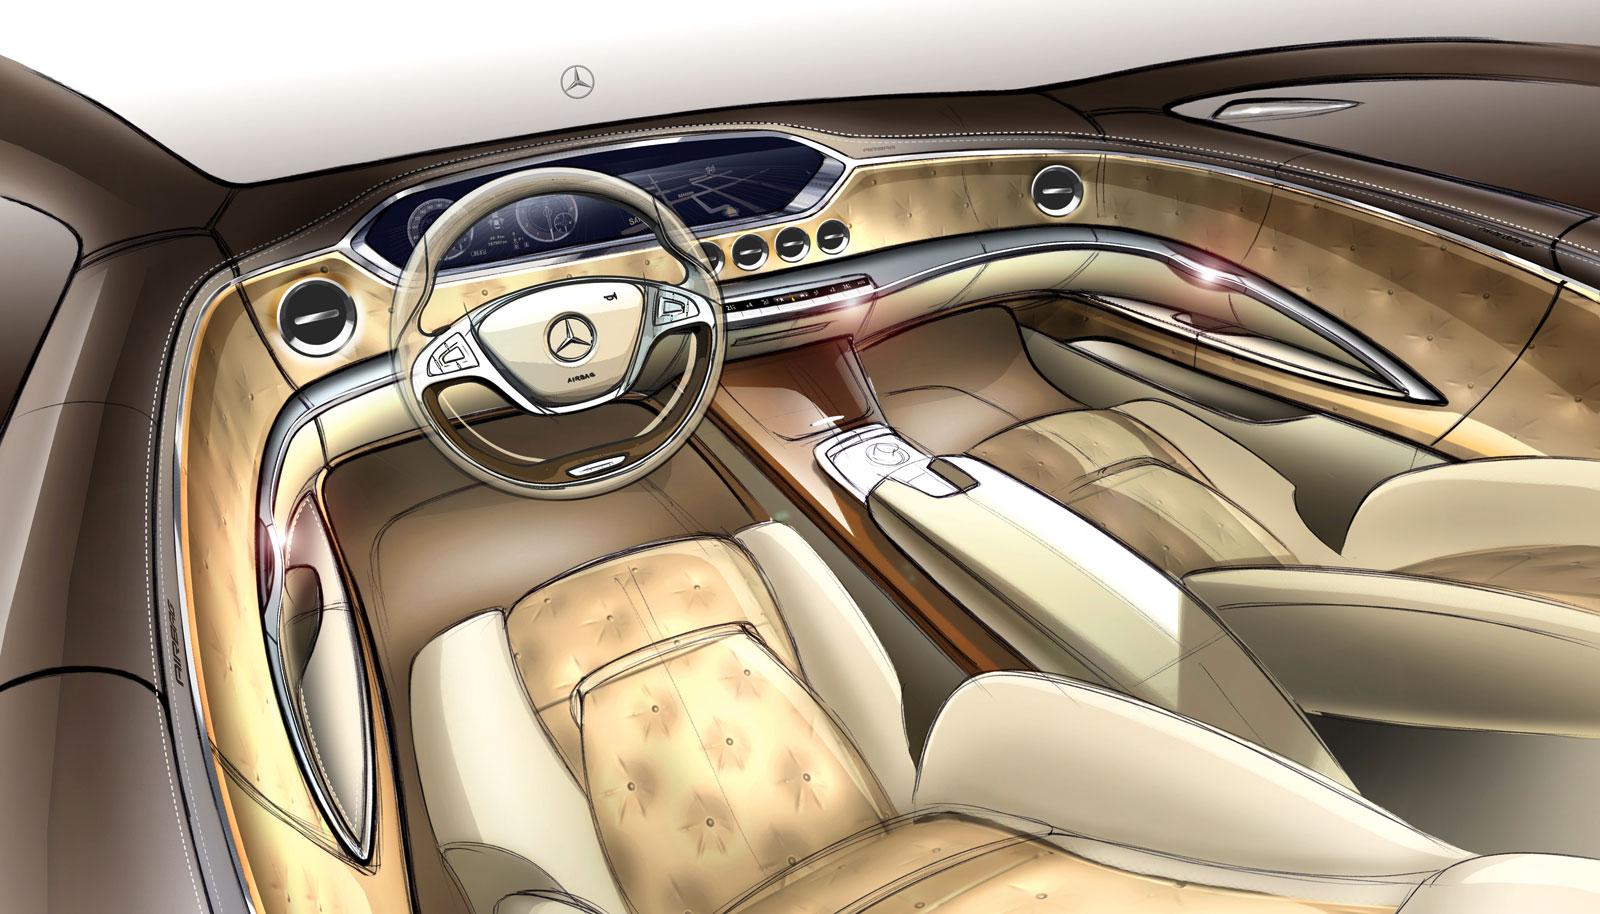 2014 Mercedes Benz S Class Interior Design Sketch Car